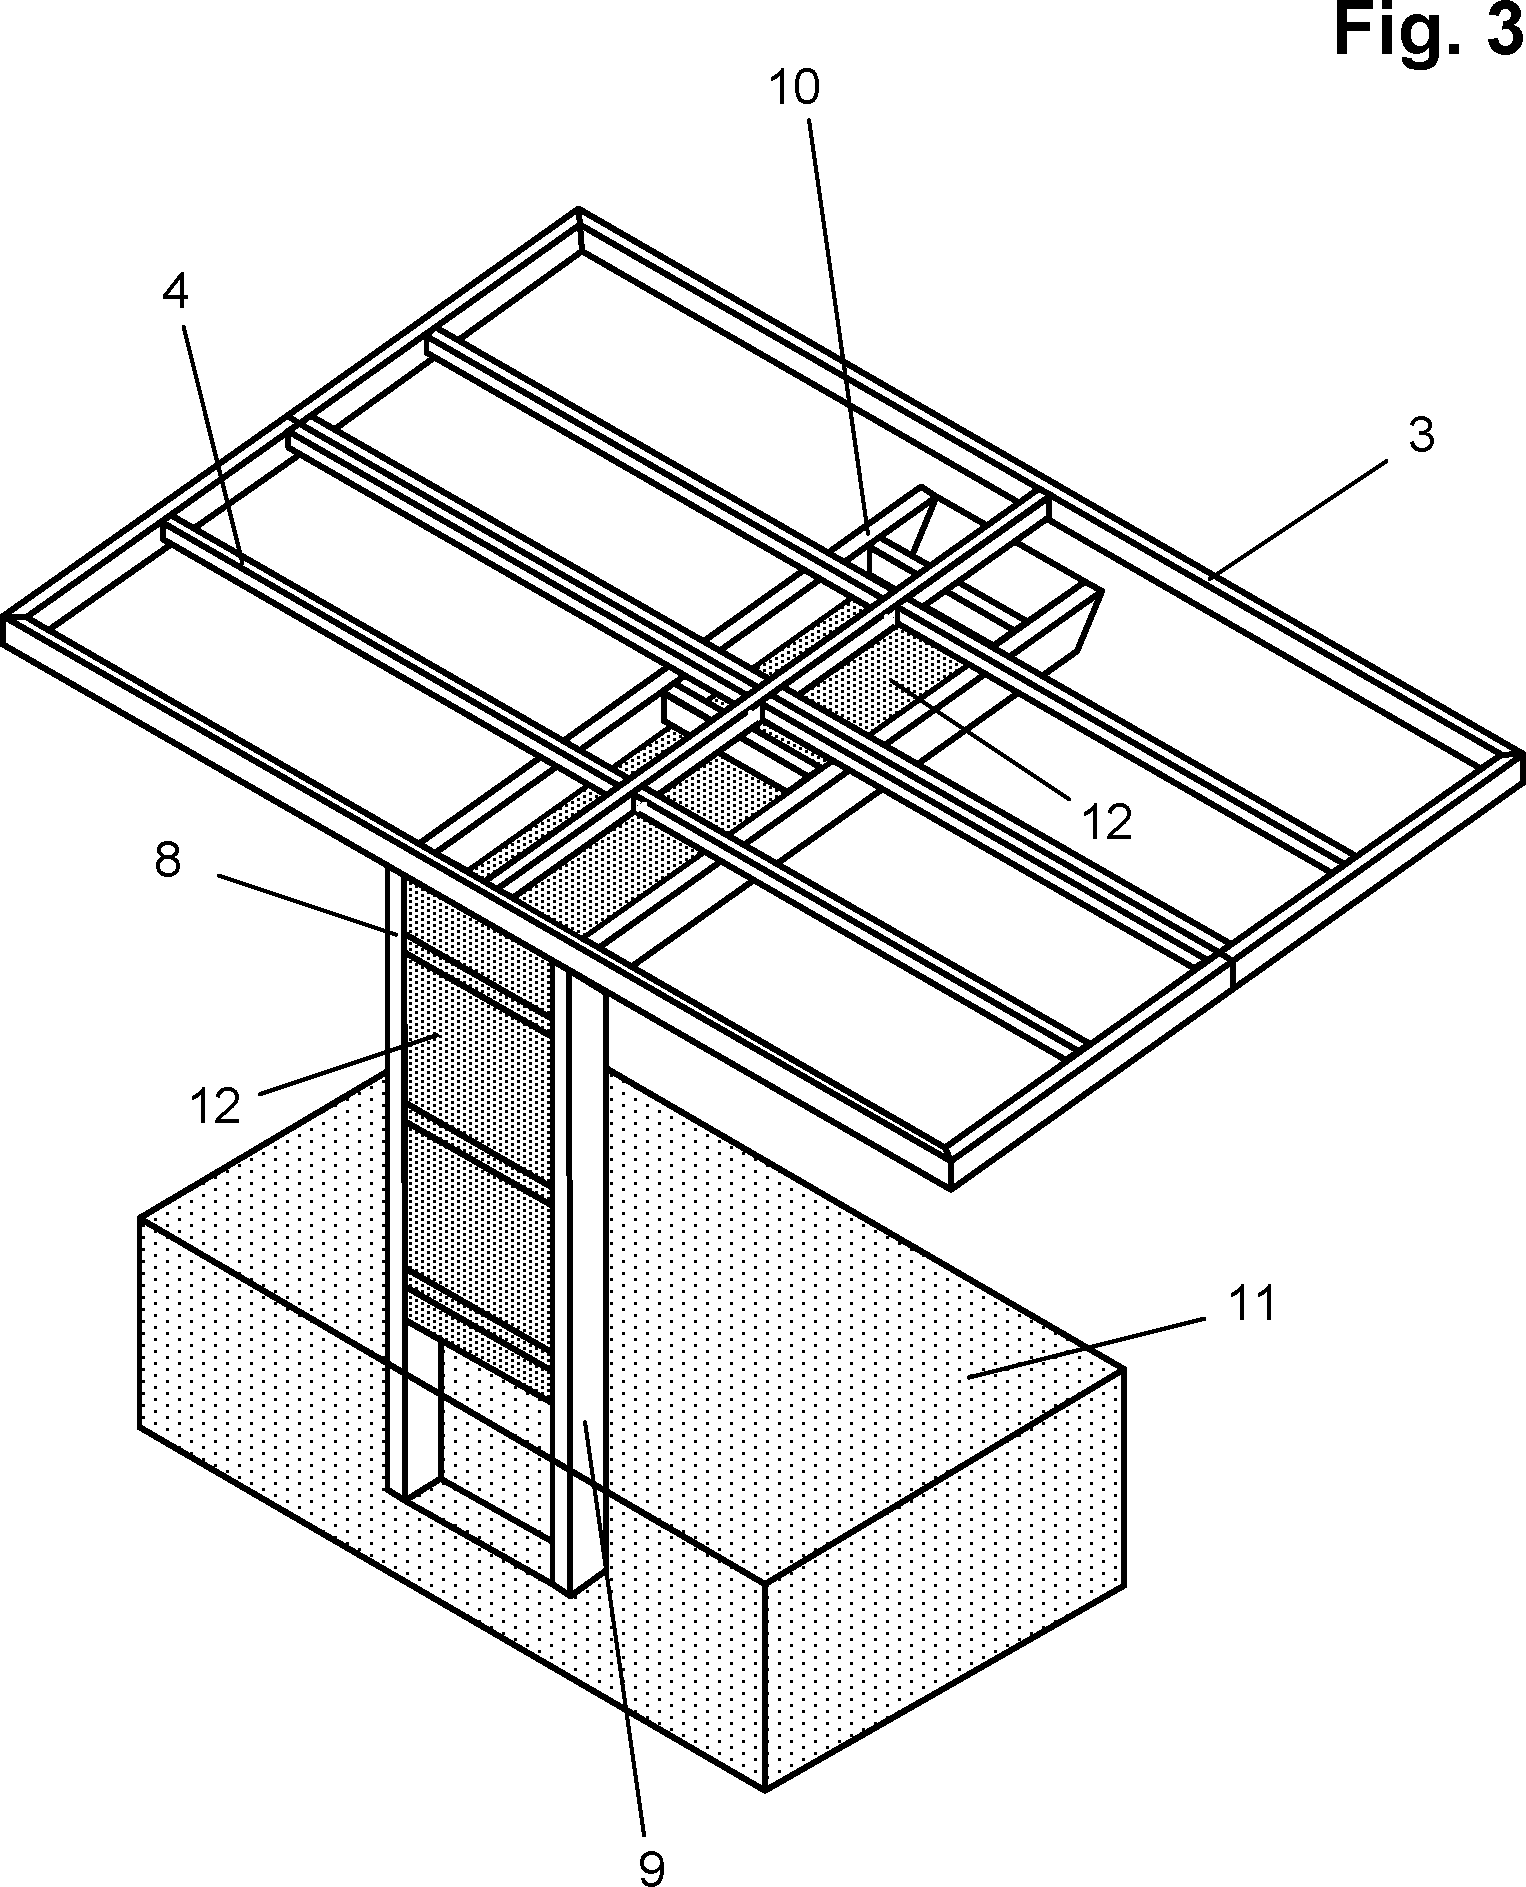 patent de202012101518u1 solarcarport mit einer. Black Bedroom Furniture Sets. Home Design Ideas